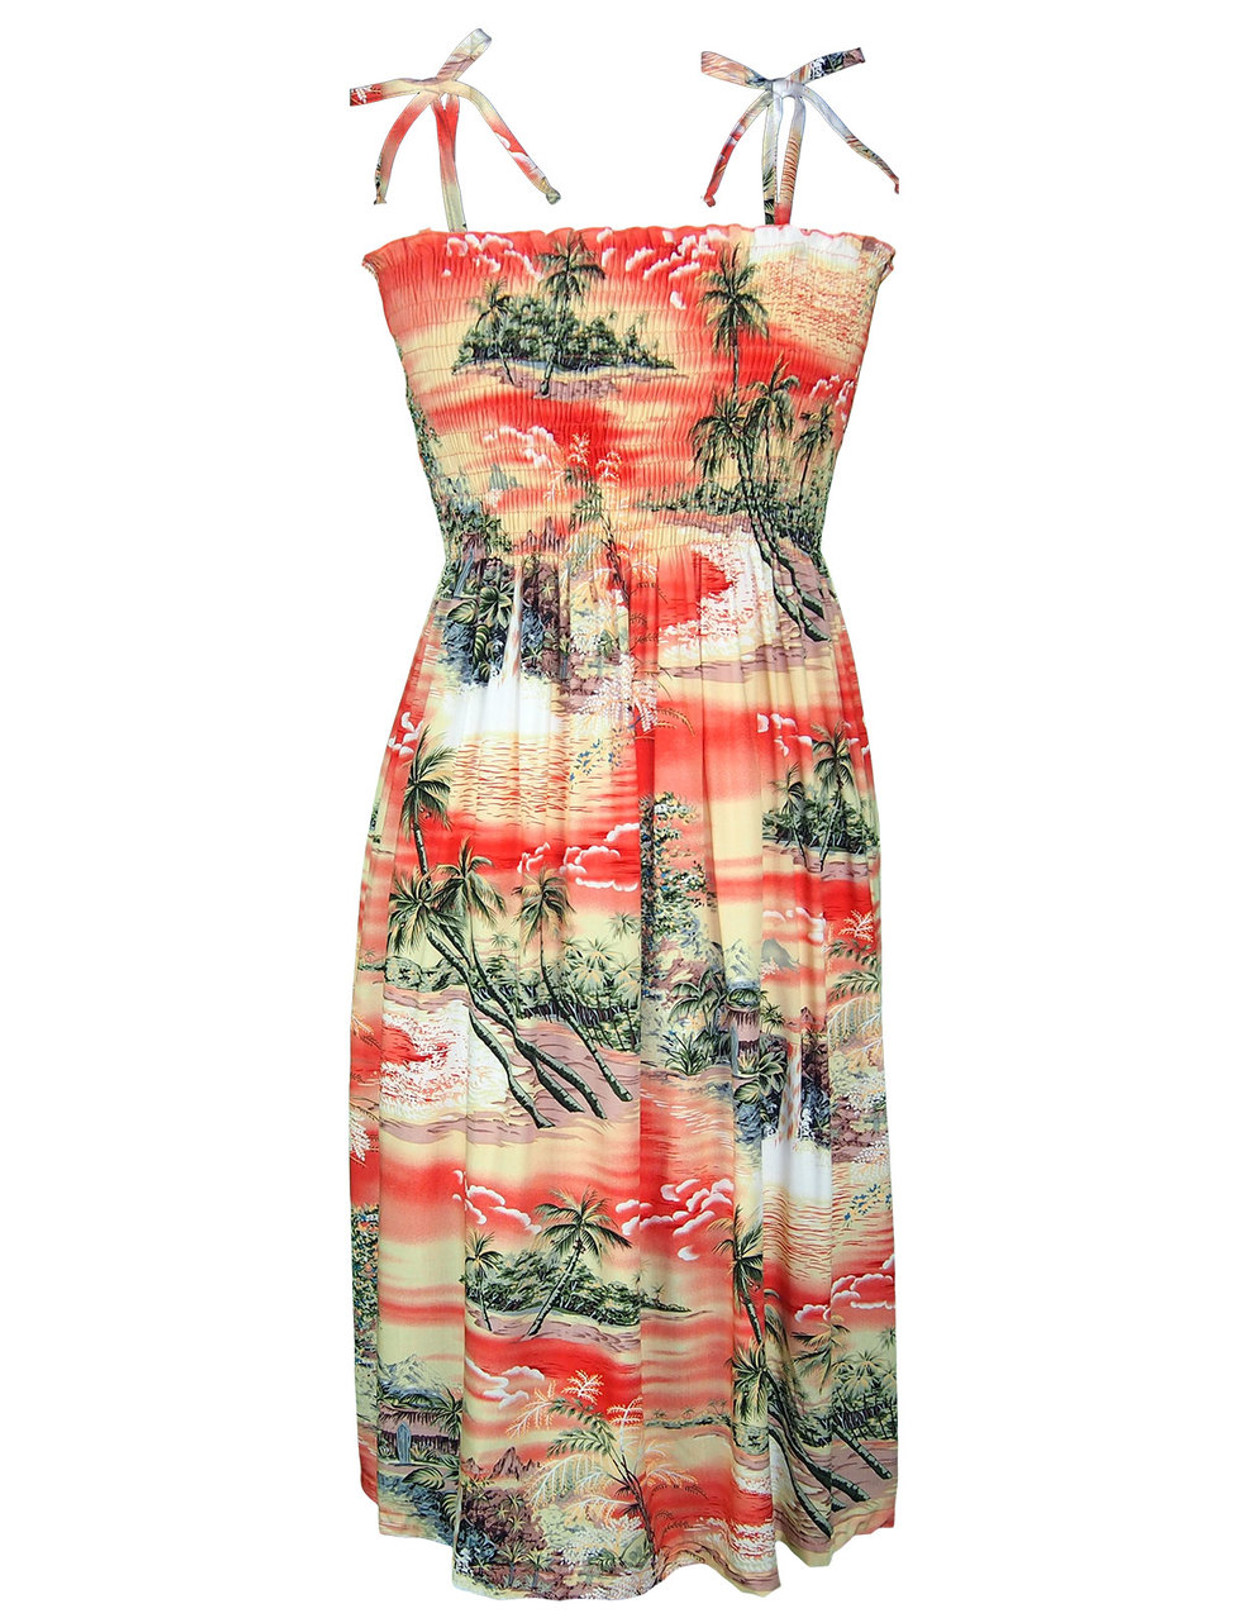 70b4ee58628 Knee Length Smock Aloha Dress Island Paradise 100% Rayon Fabric Smocked Tube  Top Design Knee